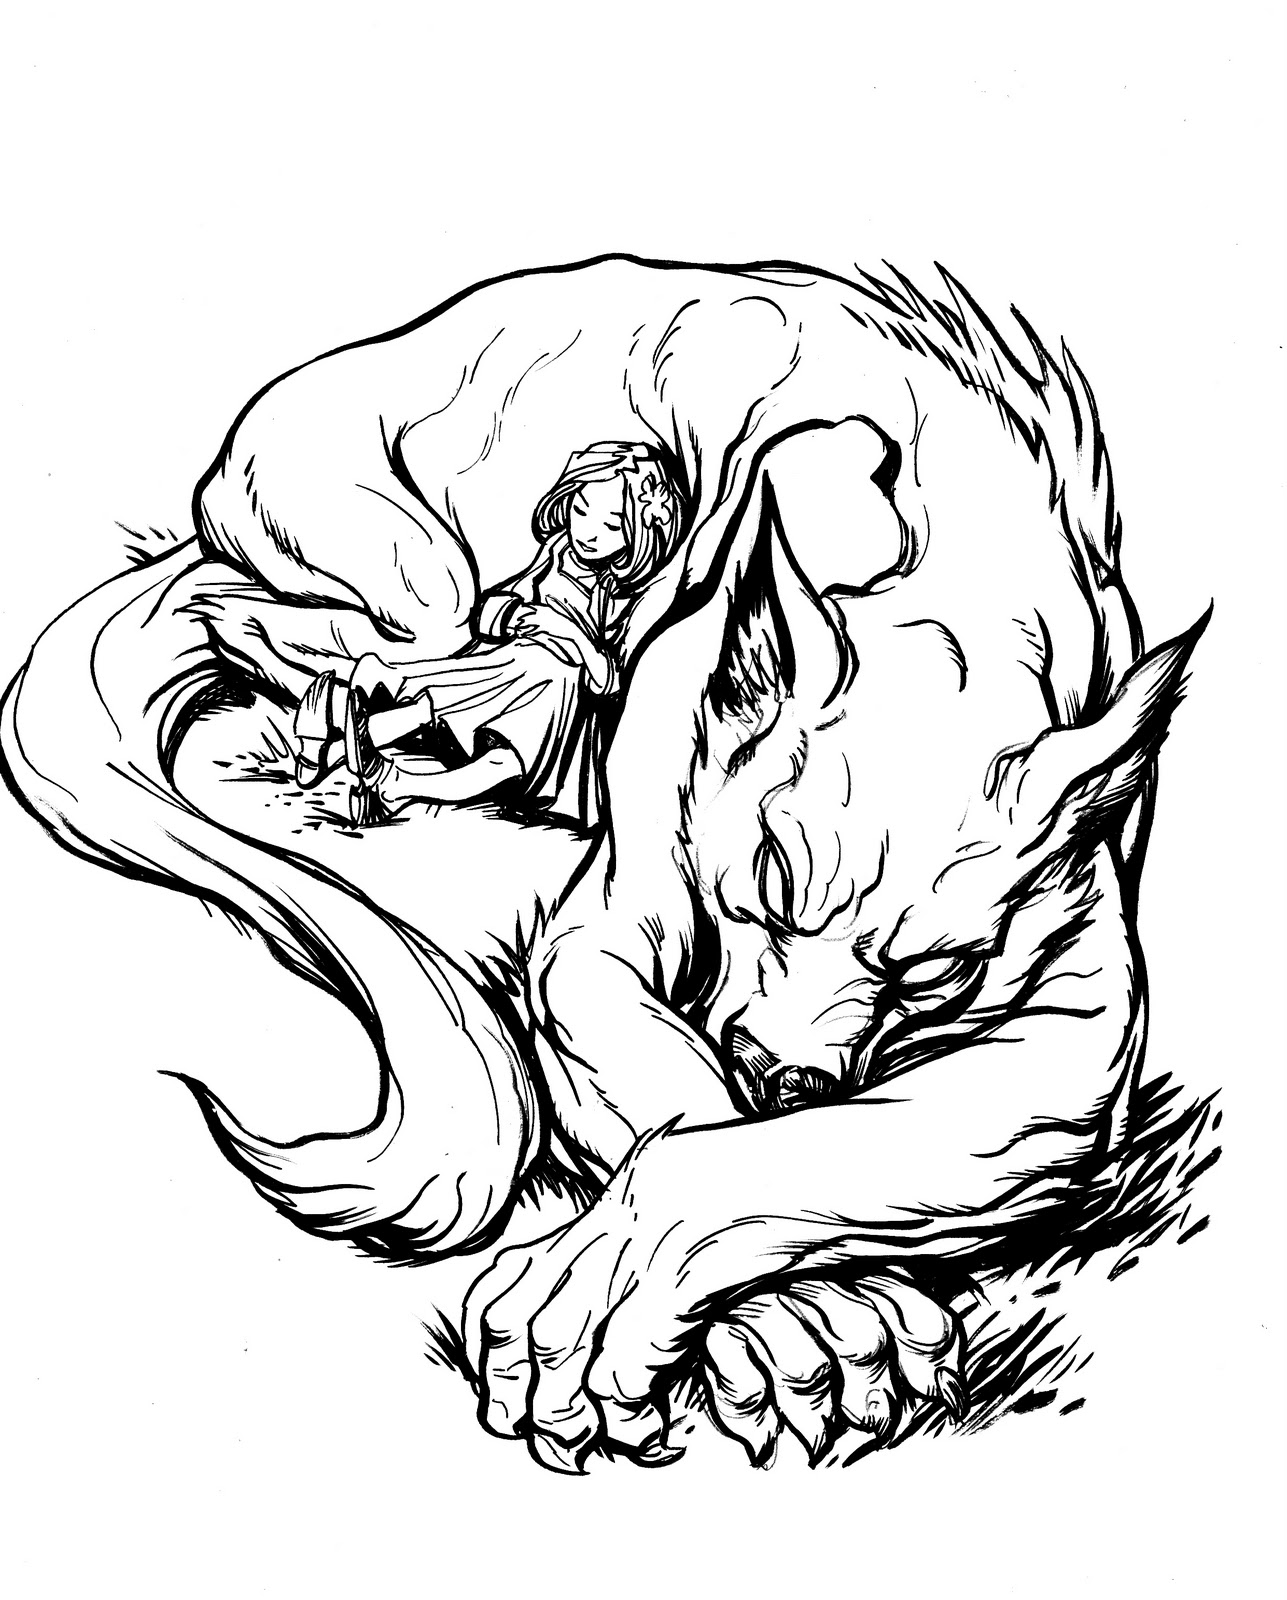 Drawn wolfman female werewolf Protecting Girl photo#14 girl Werewolf